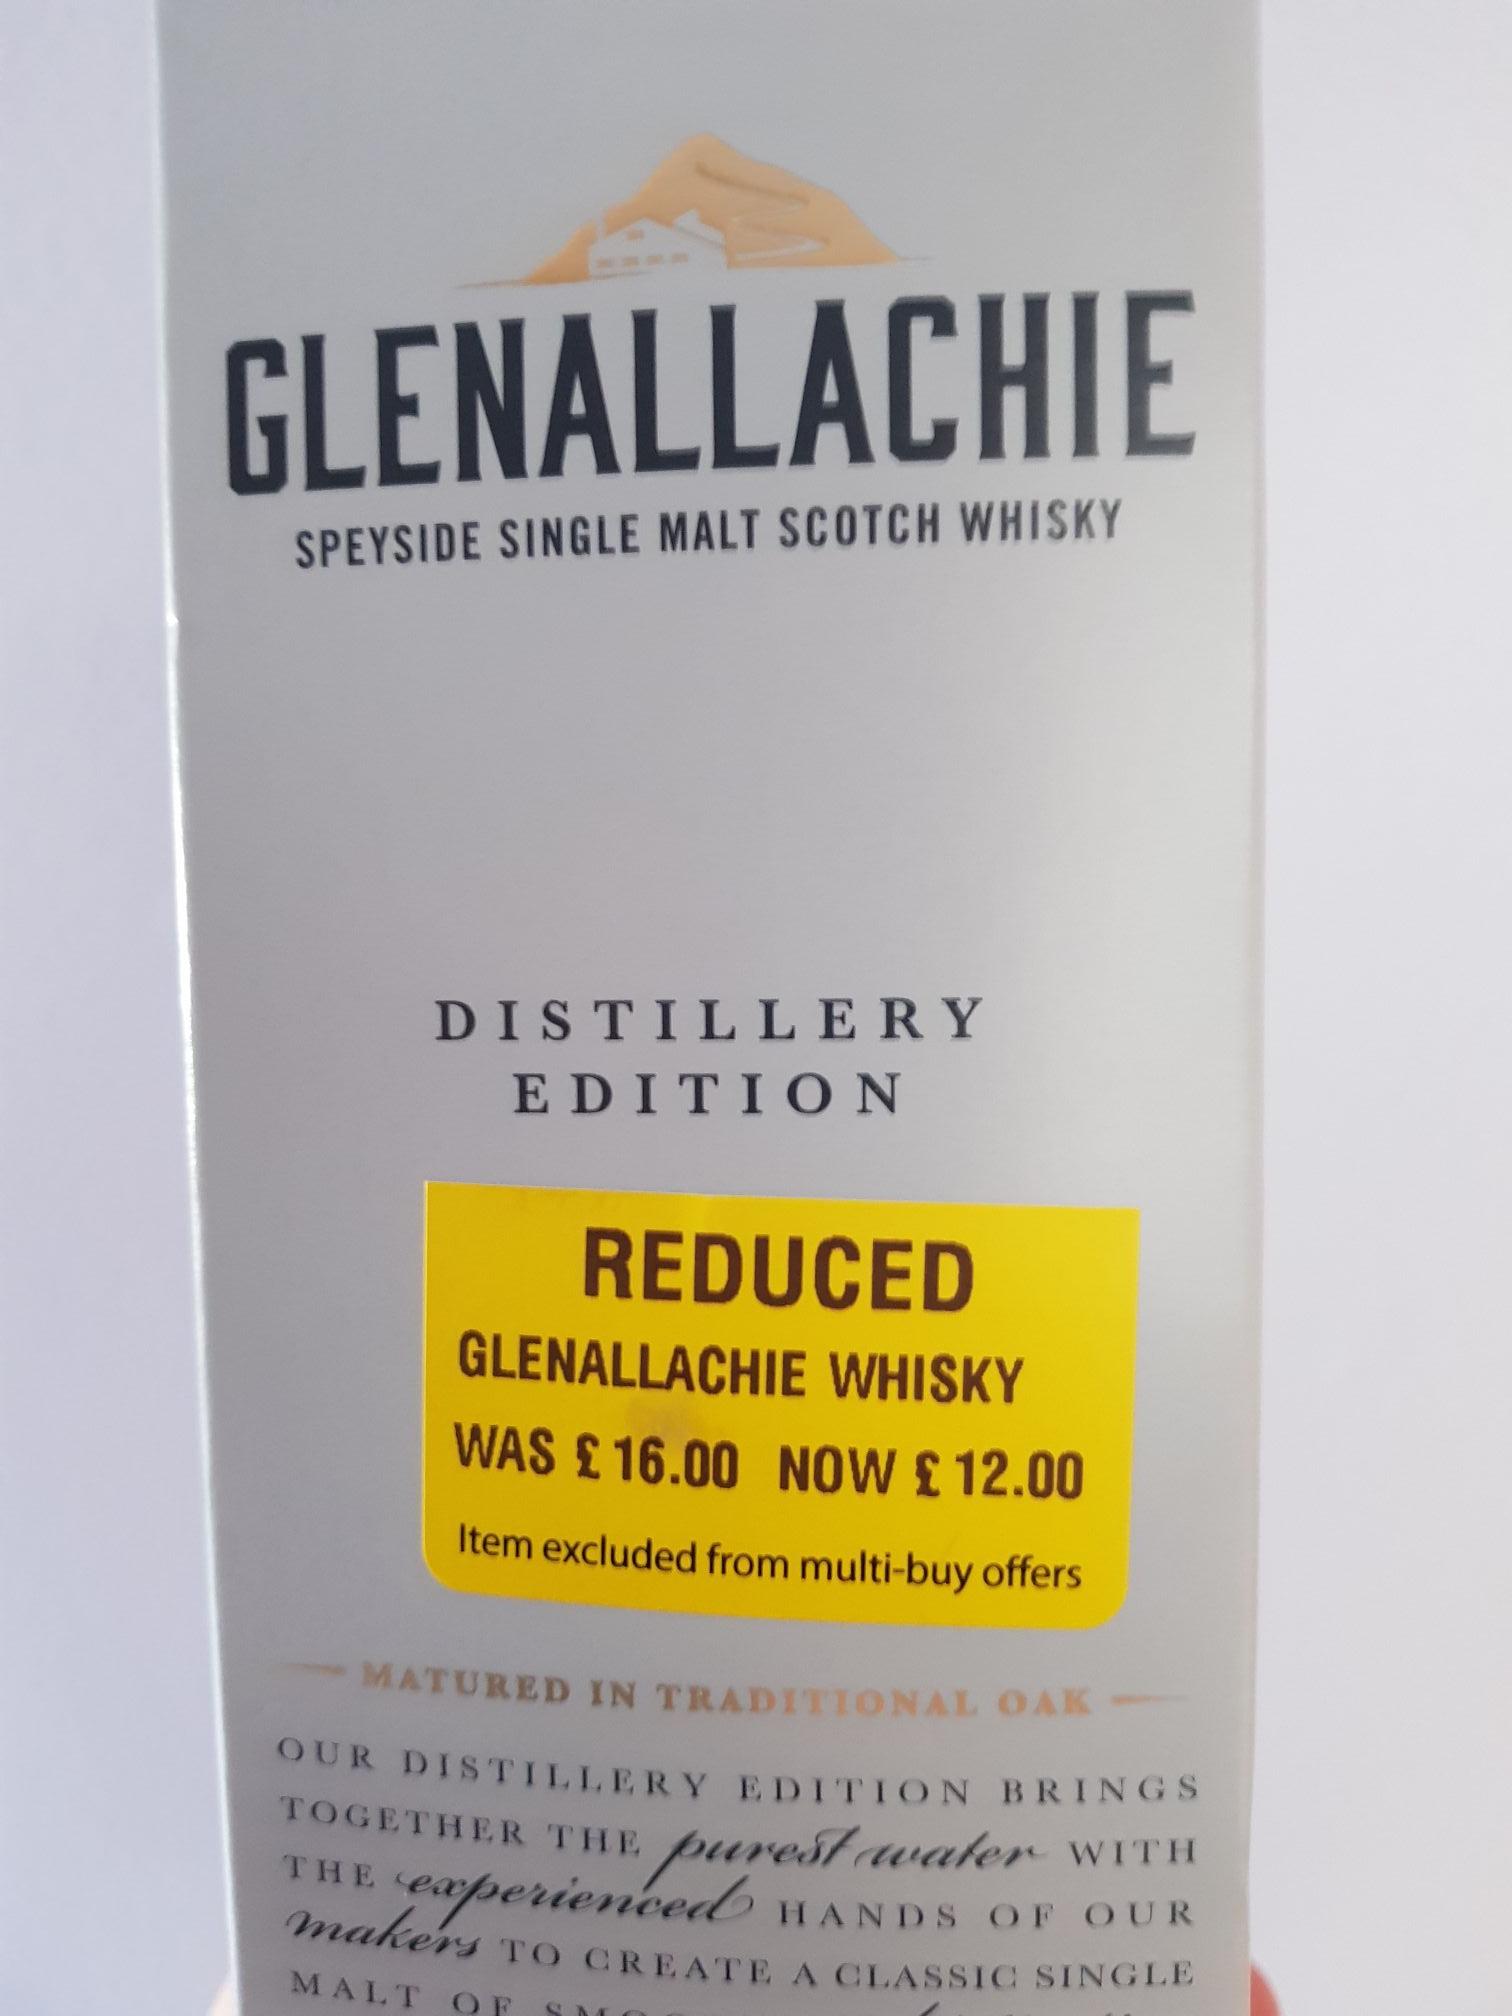 Glenallachie Distillery Edition Single Malt Whisky 70cl £12 instore at Morrisons (Kirkcaldy) - £12